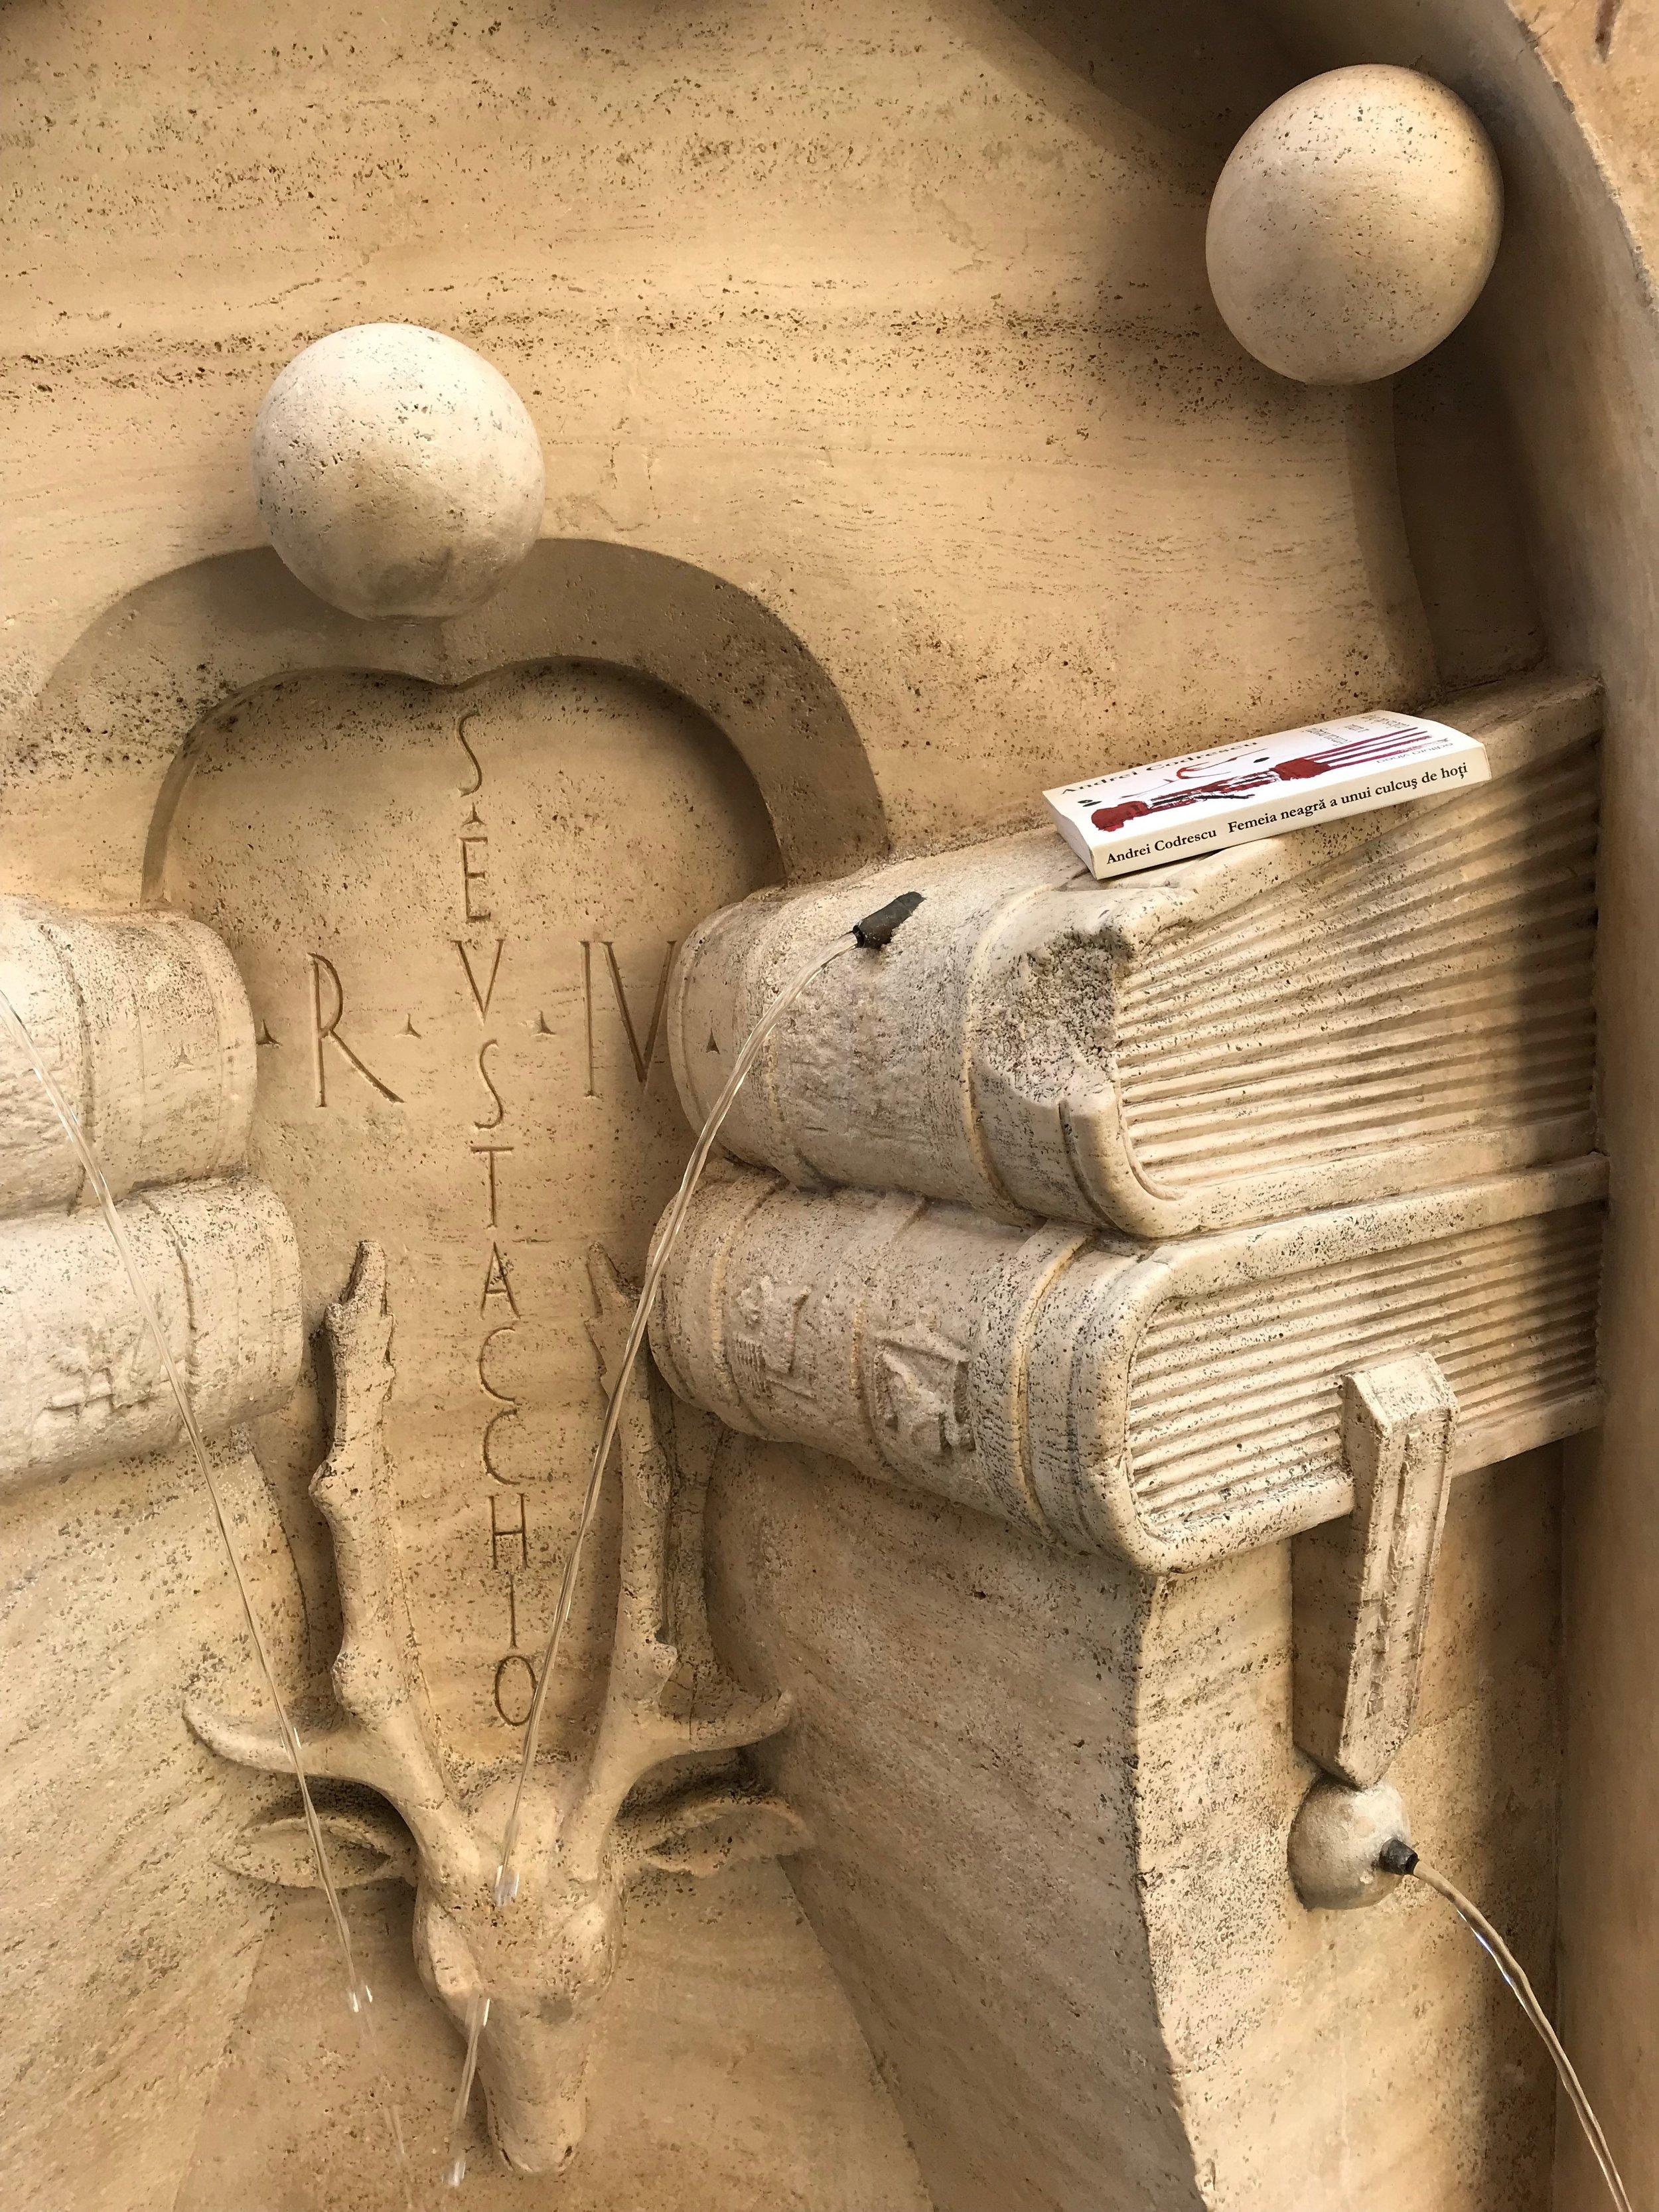 fontana de la sapienza w Codrescu book_SIDE.JPG